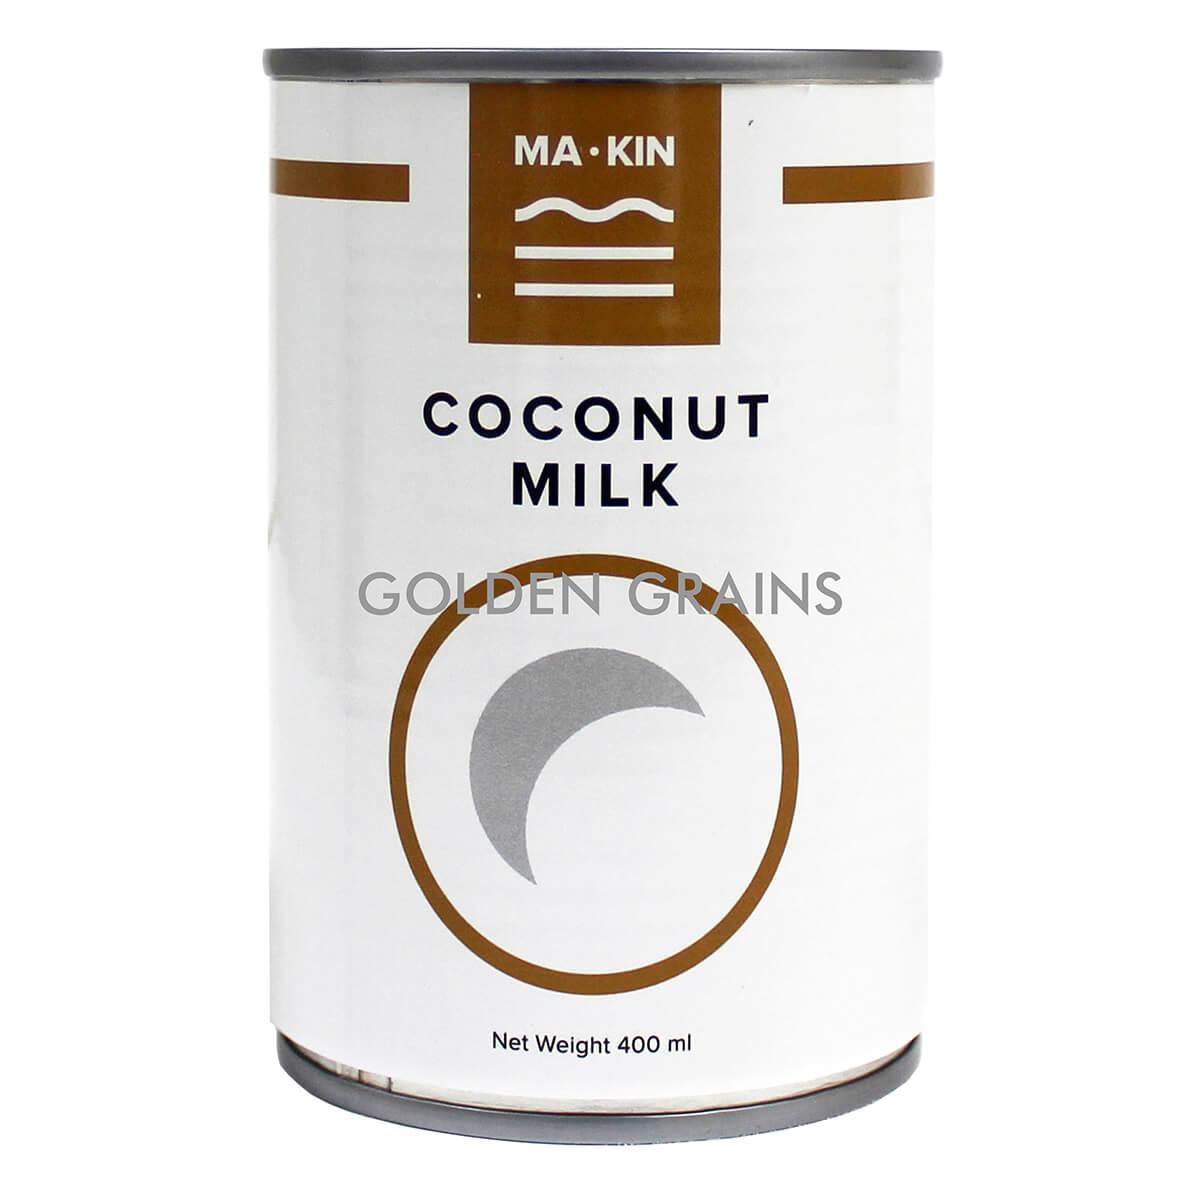 Golden Grains Dubai Export - Ma Kin - Coconut Milk - Front.jpg